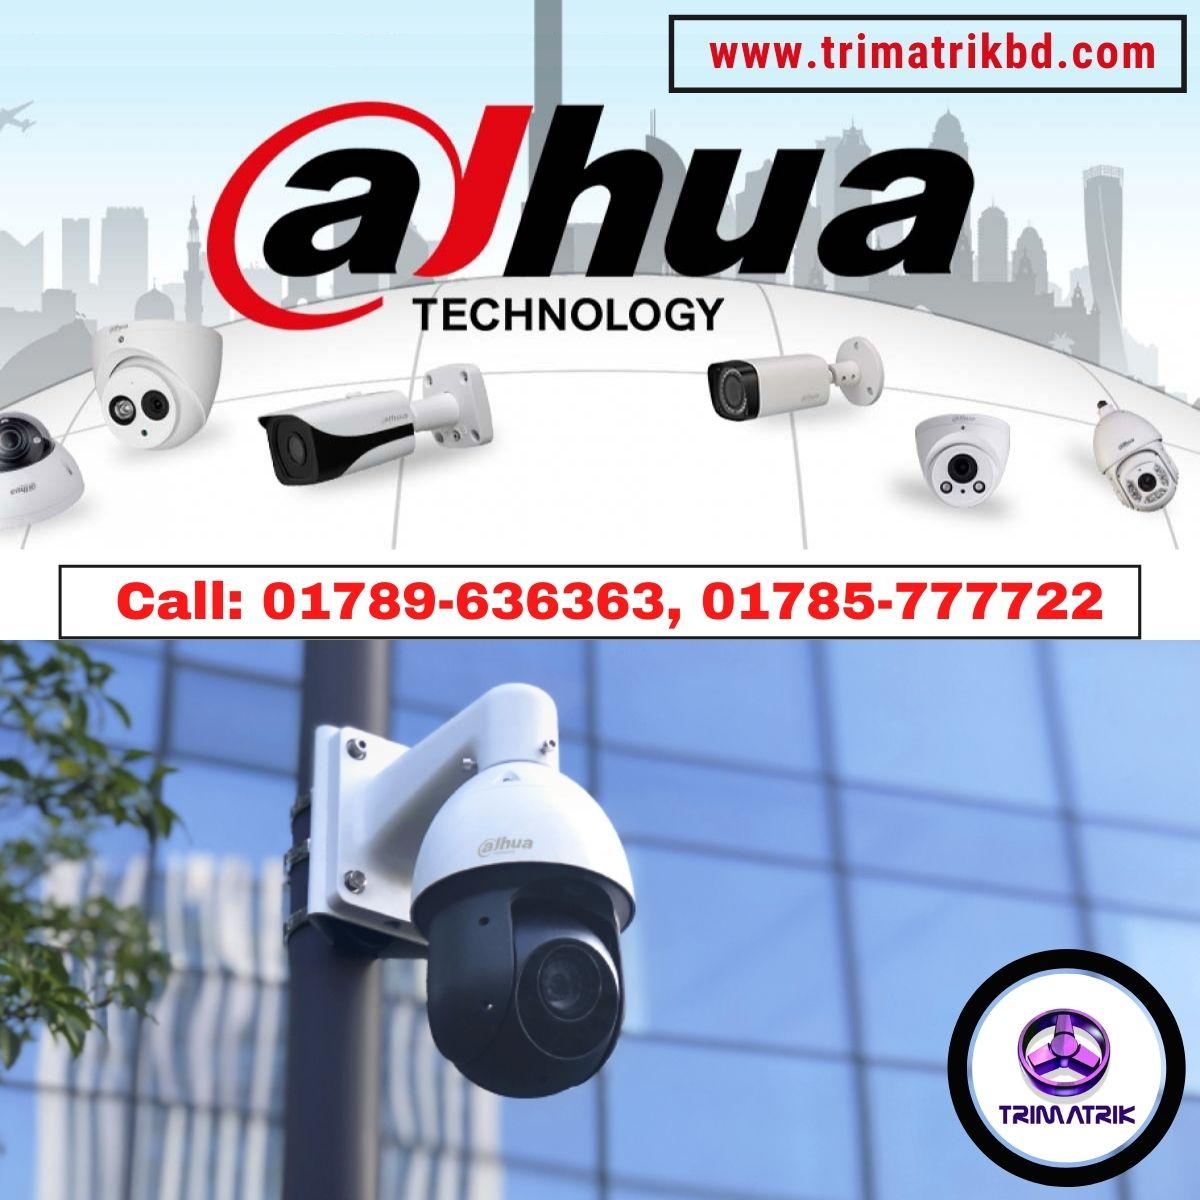 Dahua IP Camera Supplier in Bangladesh